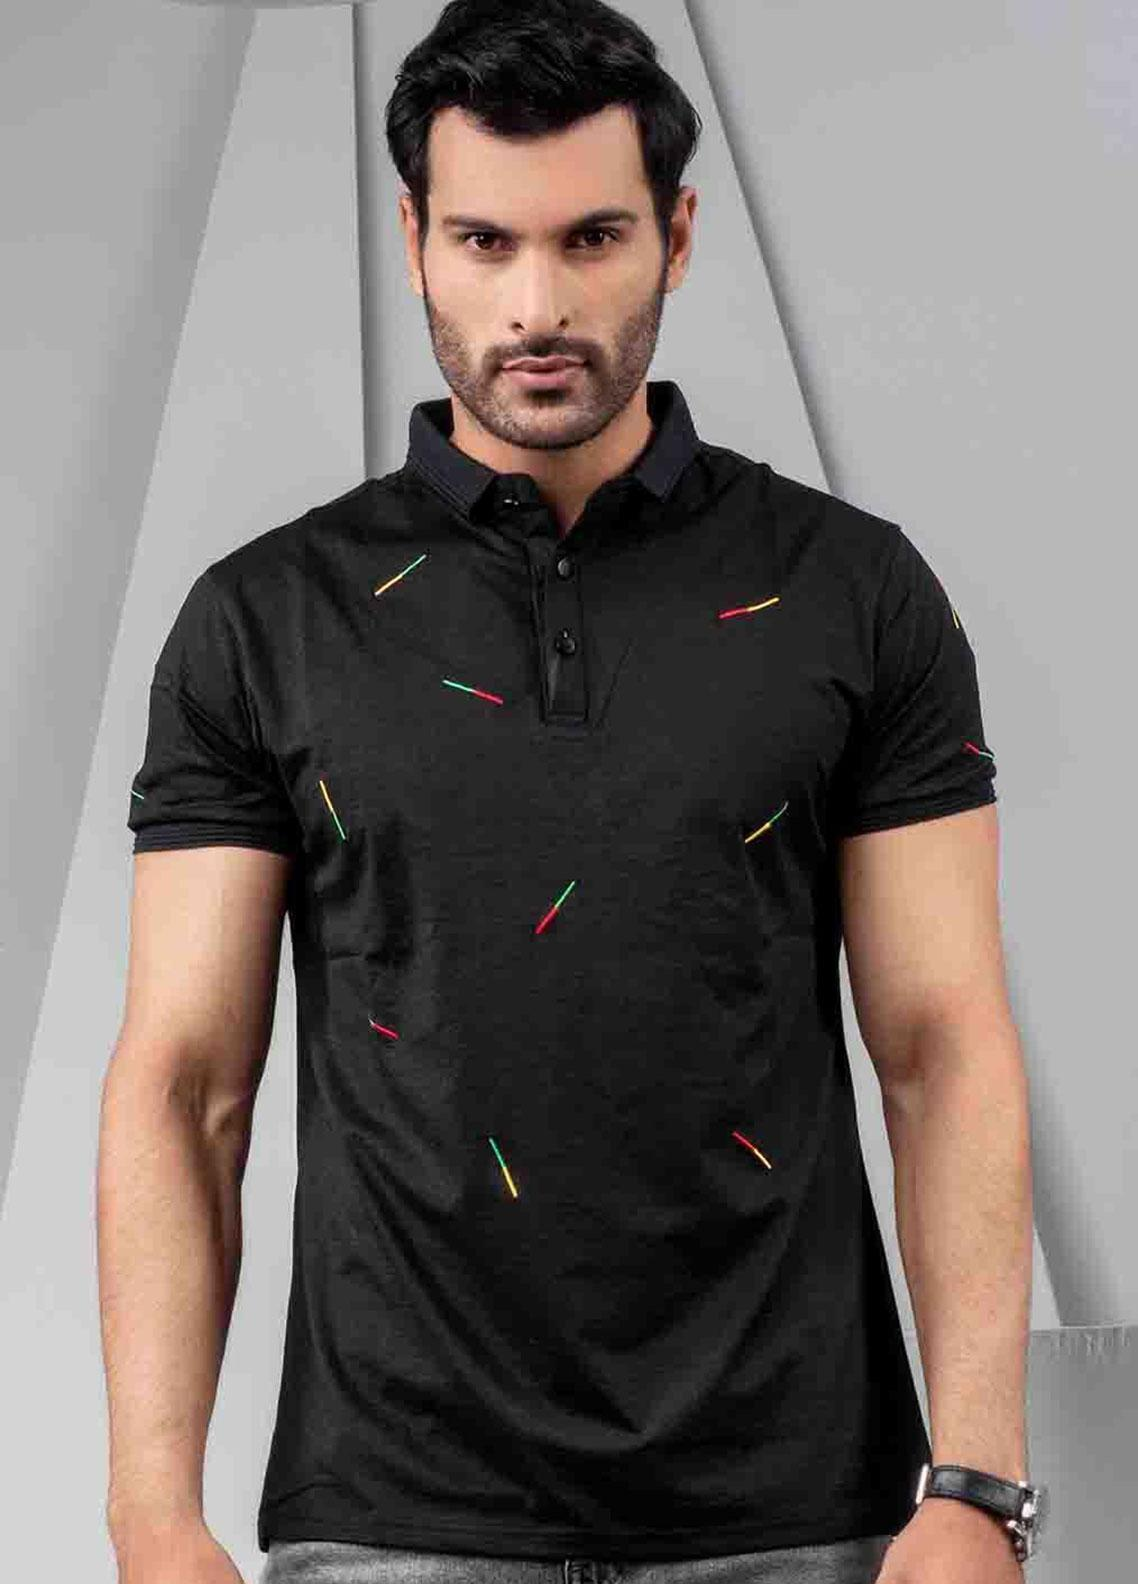 Ignite Wardrobe Polyester Embroidered Polo Shirt for Men -  IG20POM 007